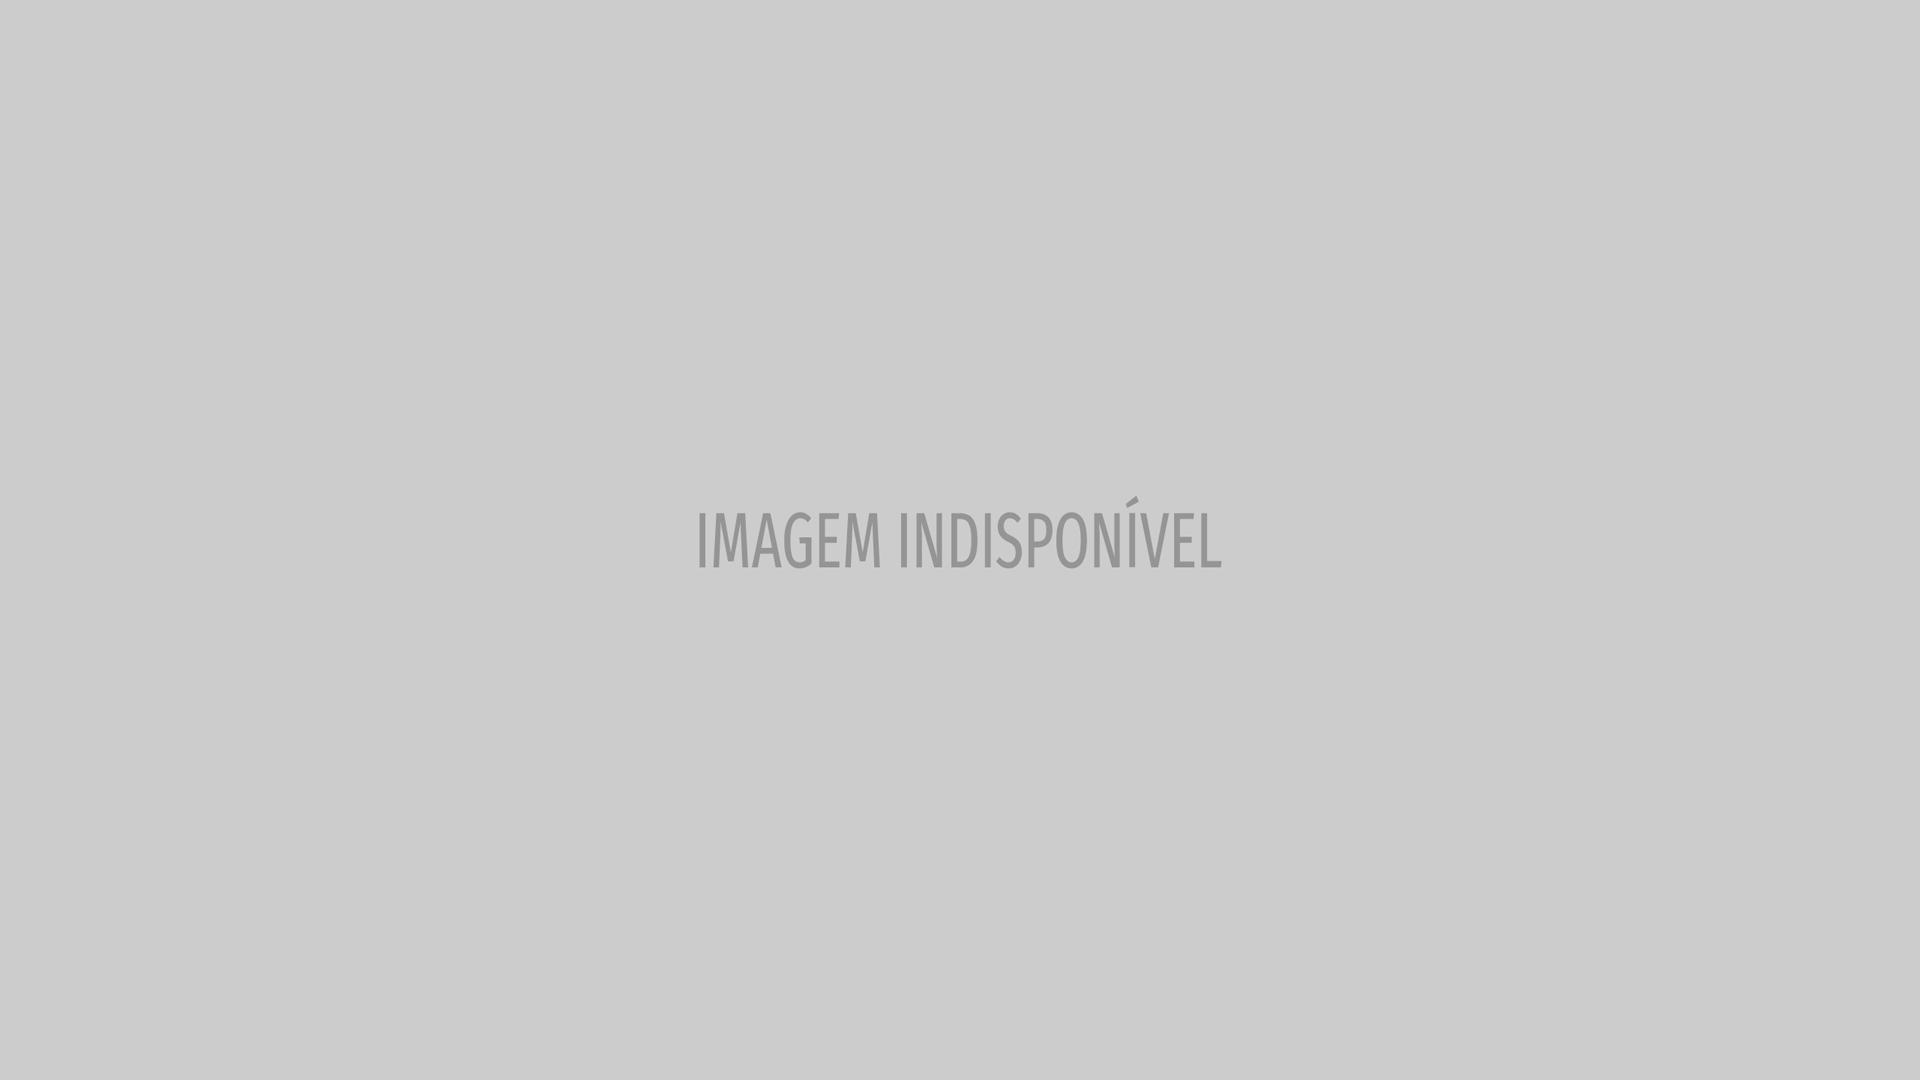 Advogado vai à Justiça contra reembolso por dentes de Feliciano